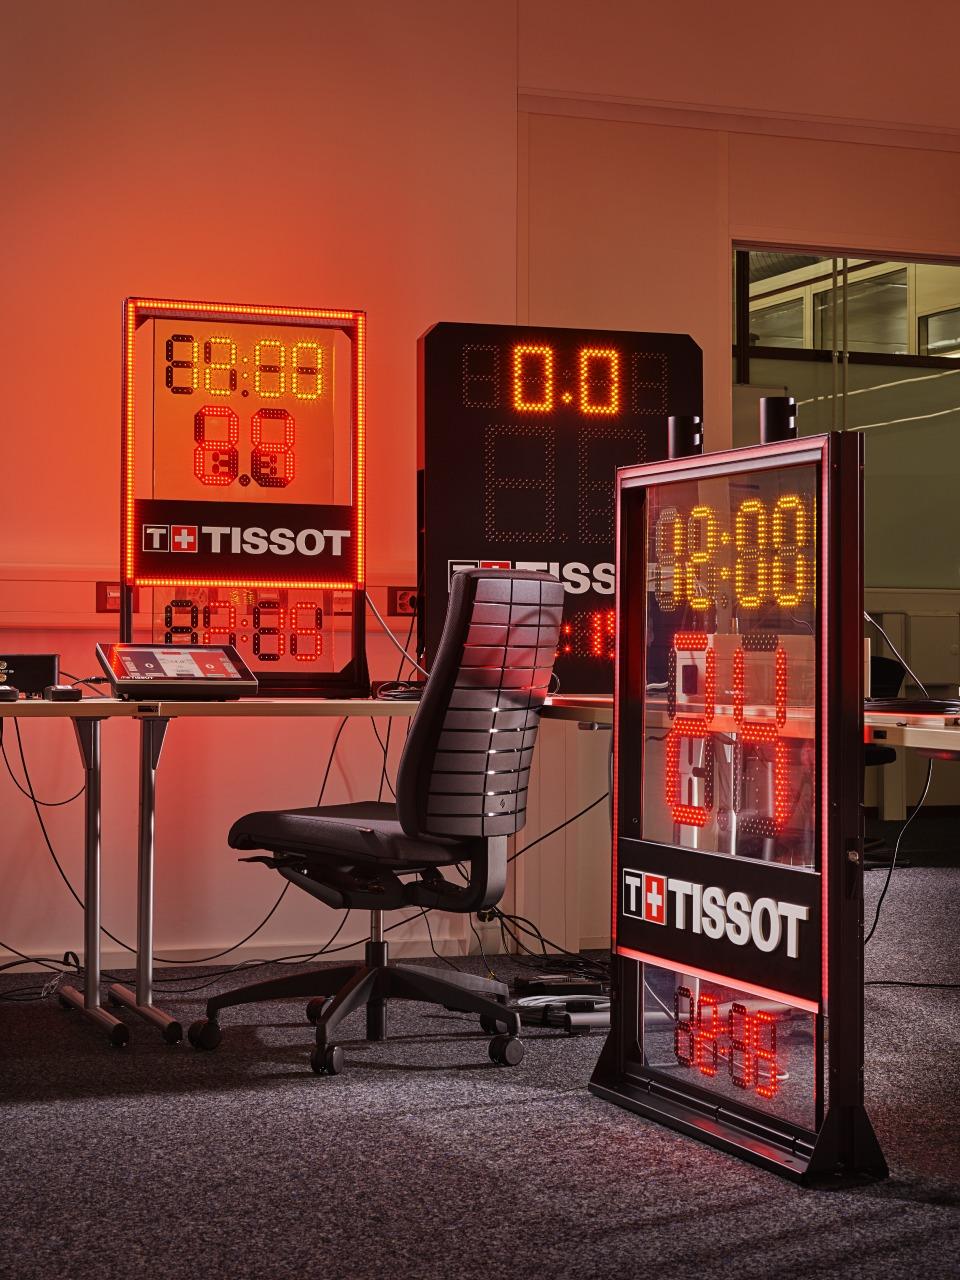 Tissot new nba clock basketball